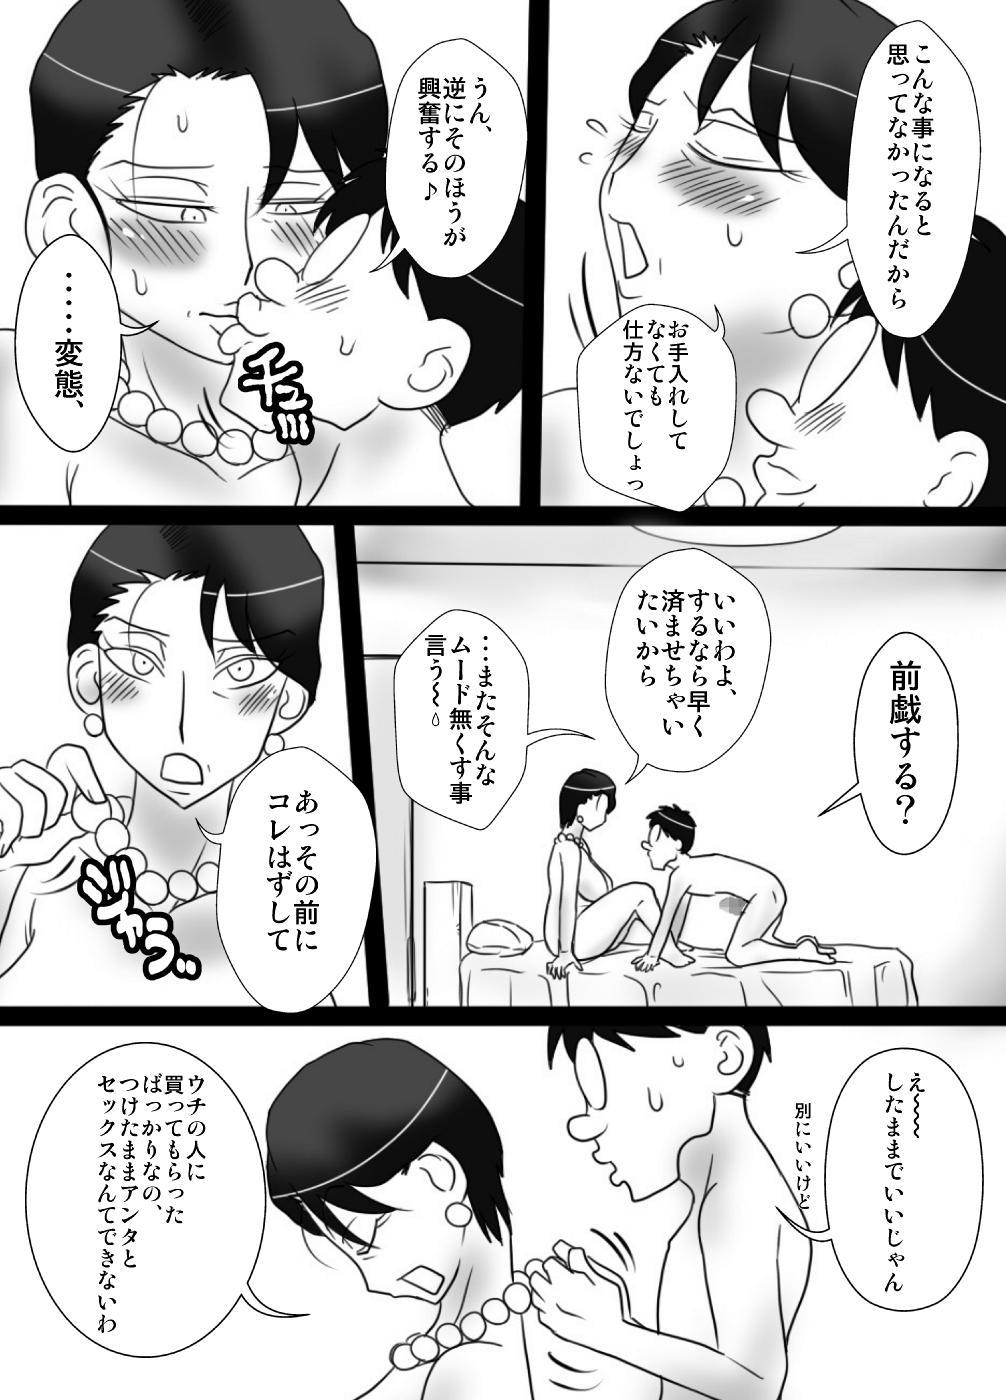 Oba-san o Otosuze! 20